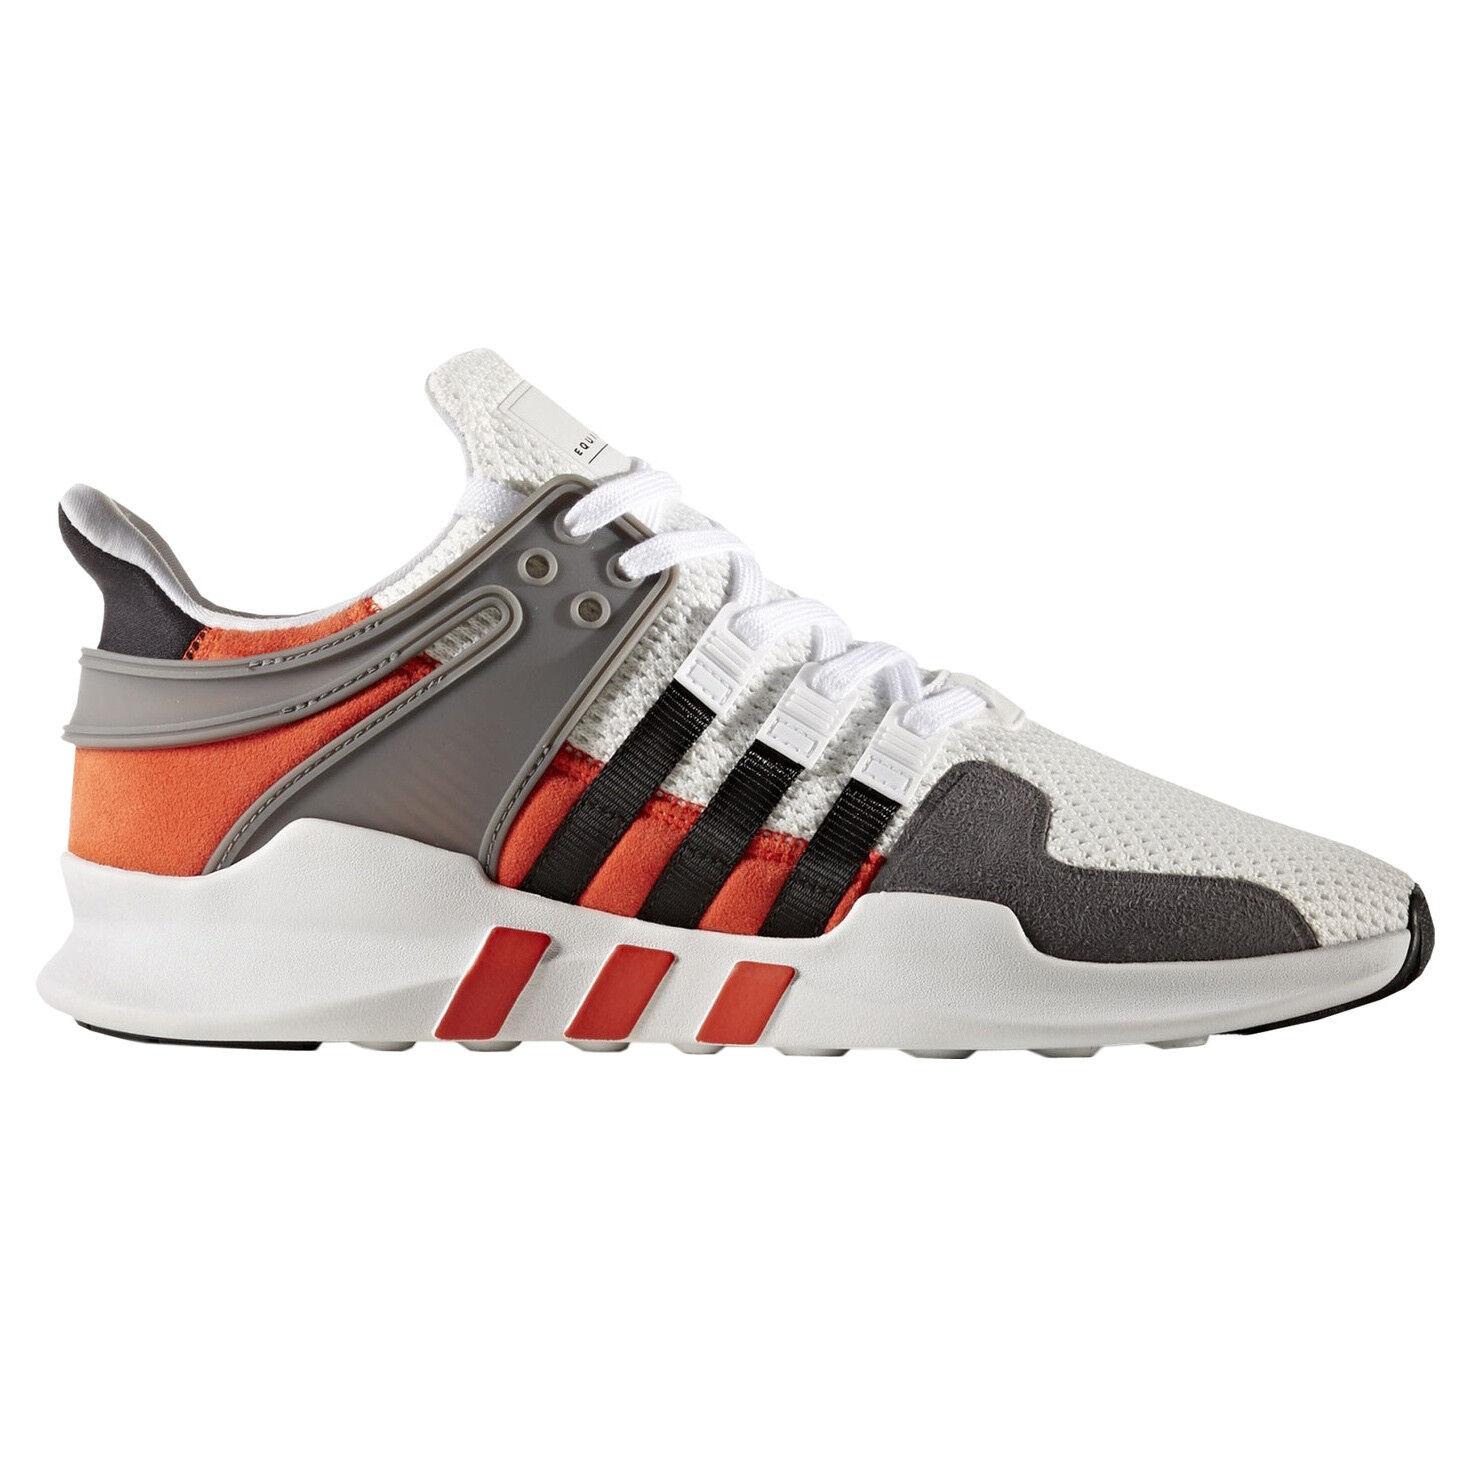 Adidas Sneaker Originals Equipment Support ADV Sneaker Adidas Sportschuhe Turnschuhe BY9584 96c447